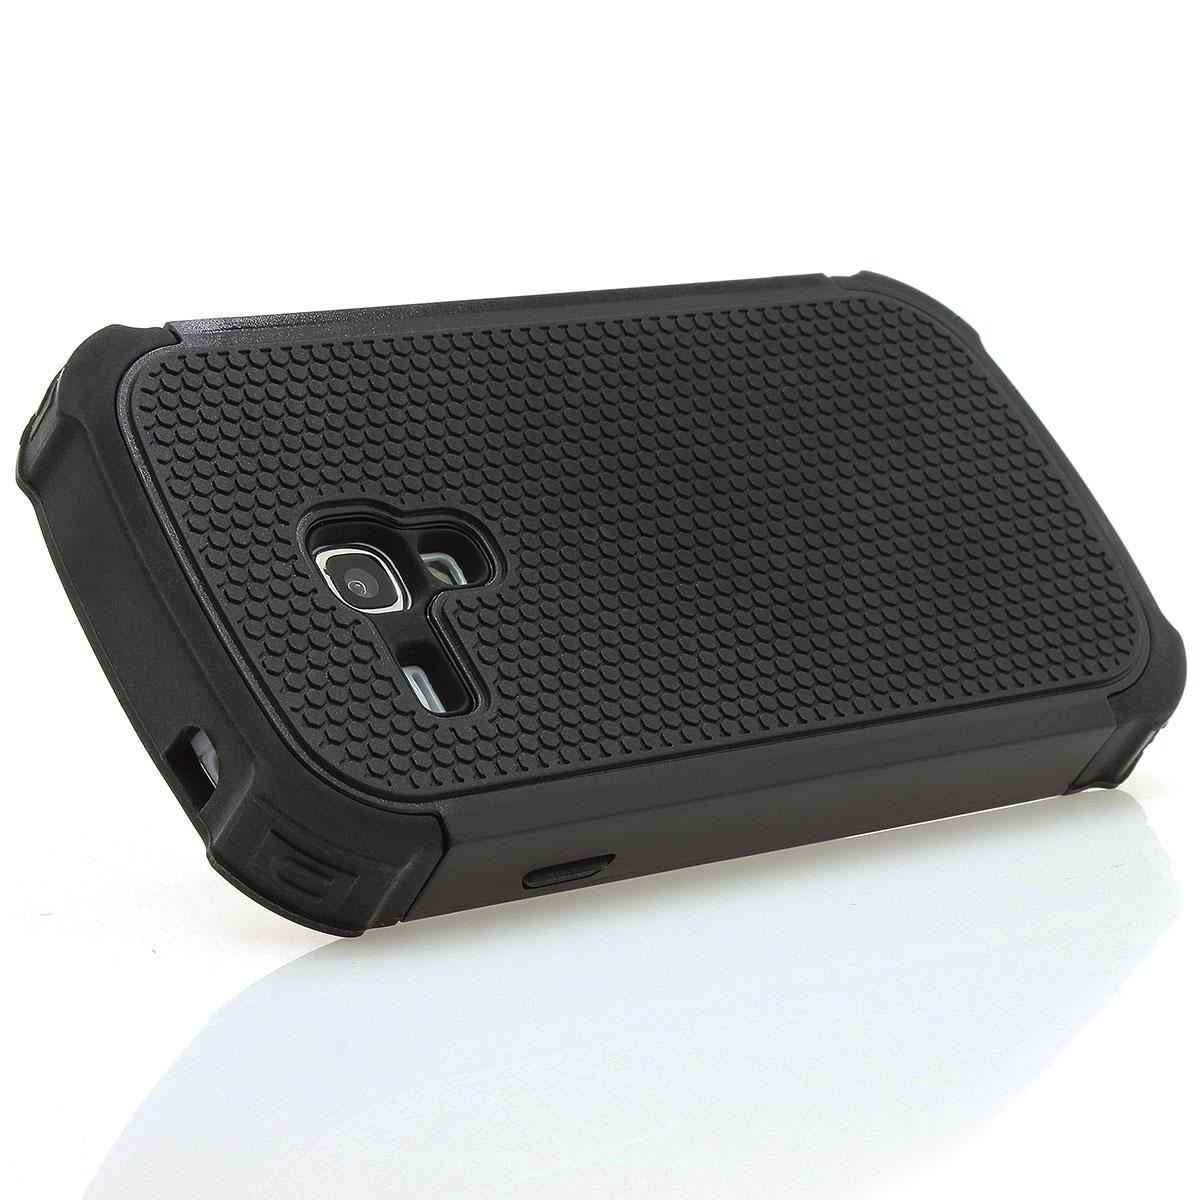 samsung galaxy s3 mini i8190 outdoor silikon schutzh lle. Black Bedroom Furniture Sets. Home Design Ideas